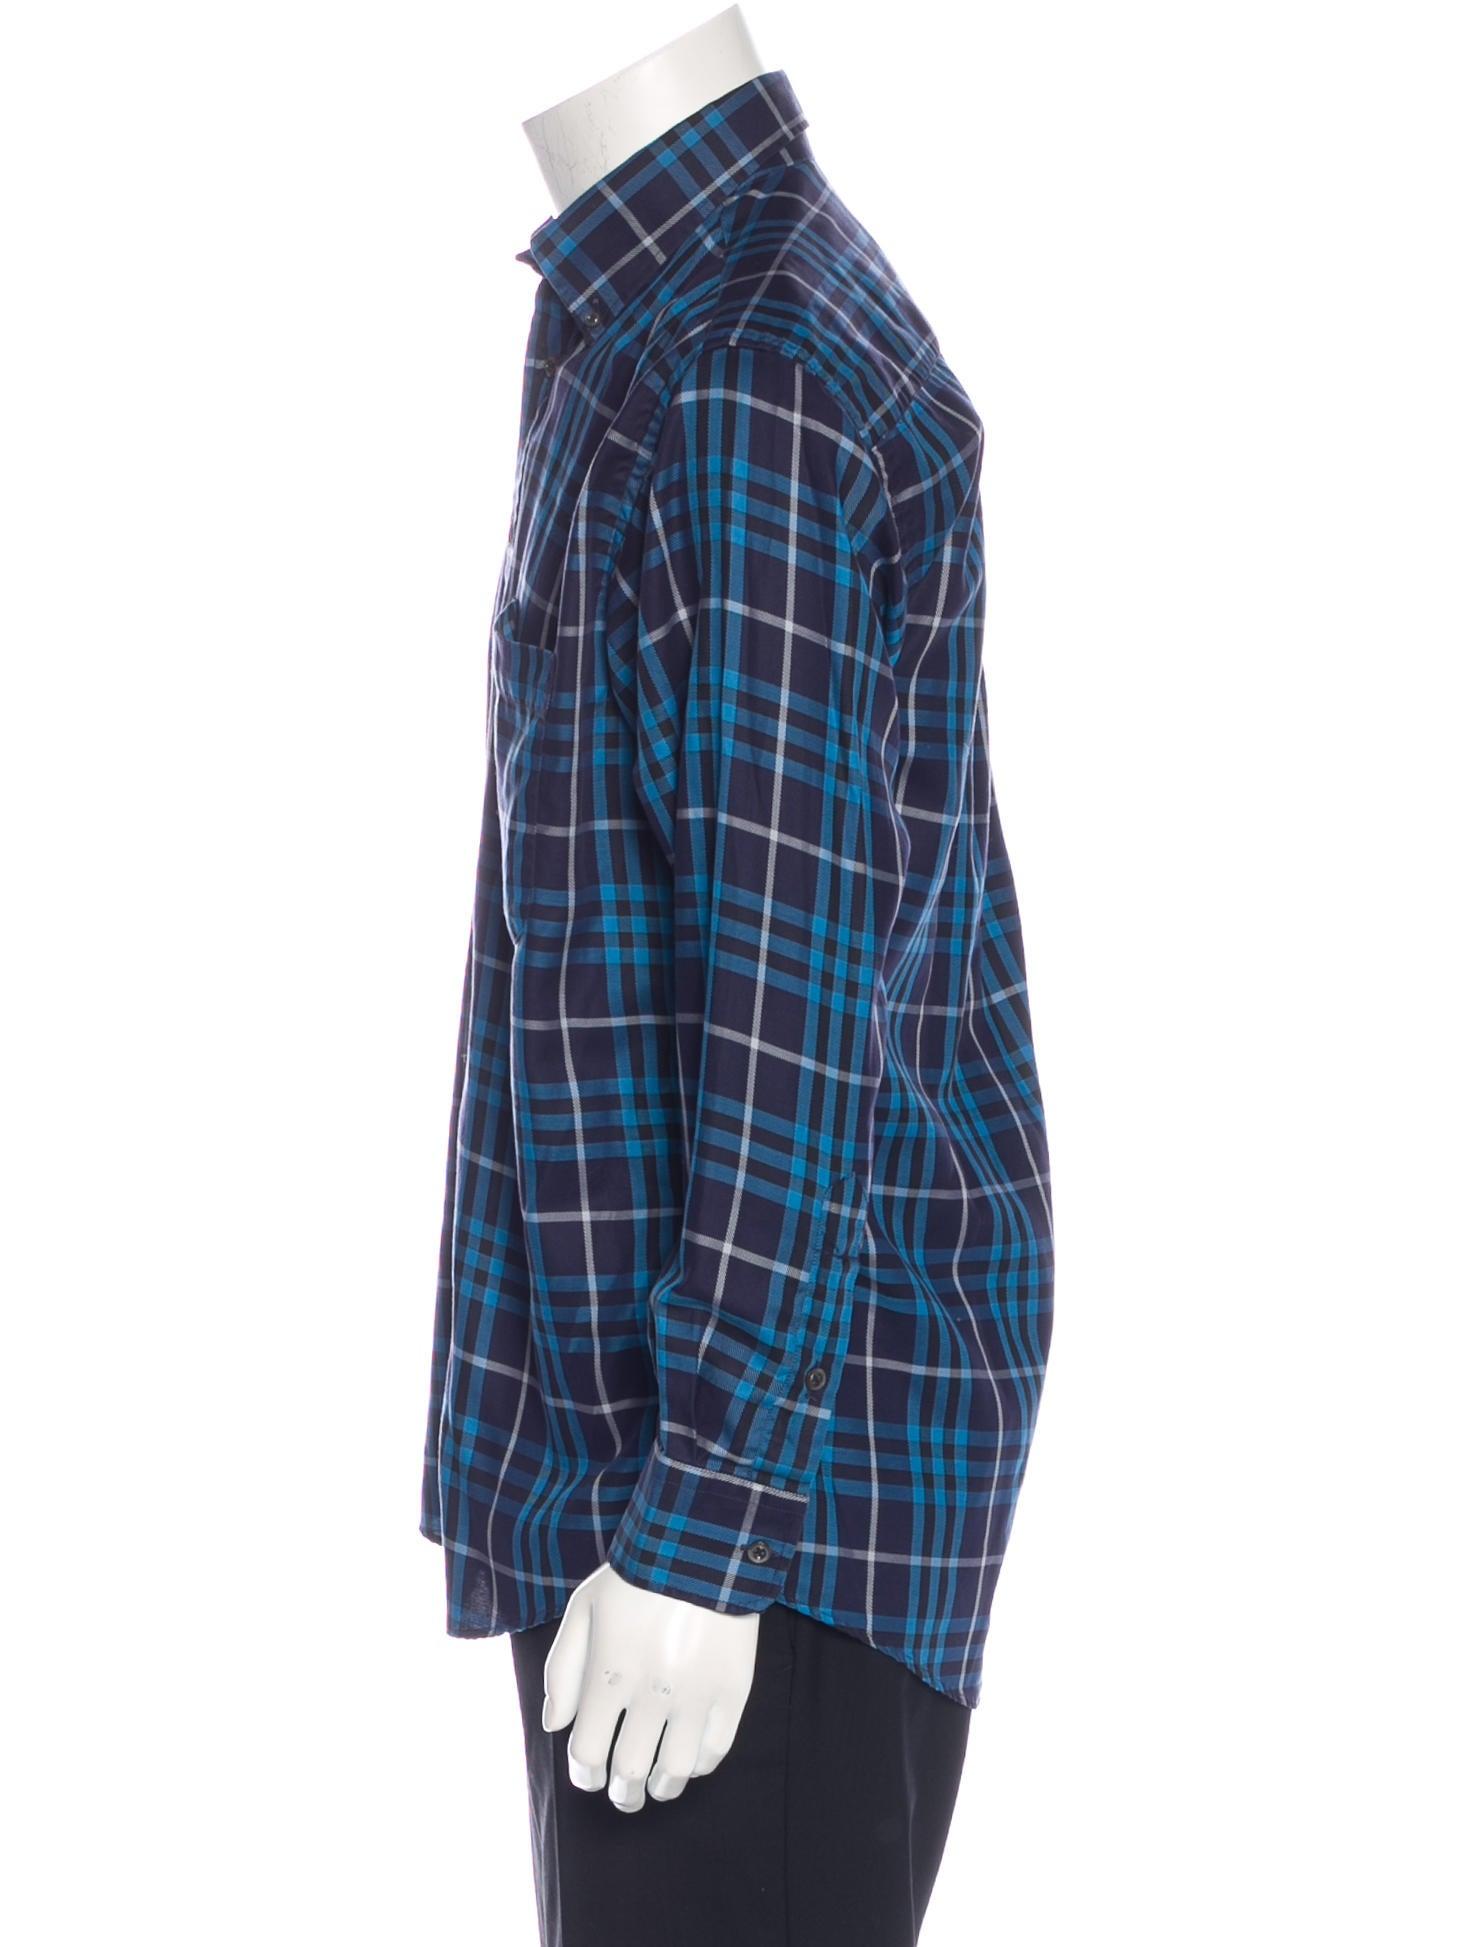 Burberry London Plaid Woven Shirt Clothing Wburl24327